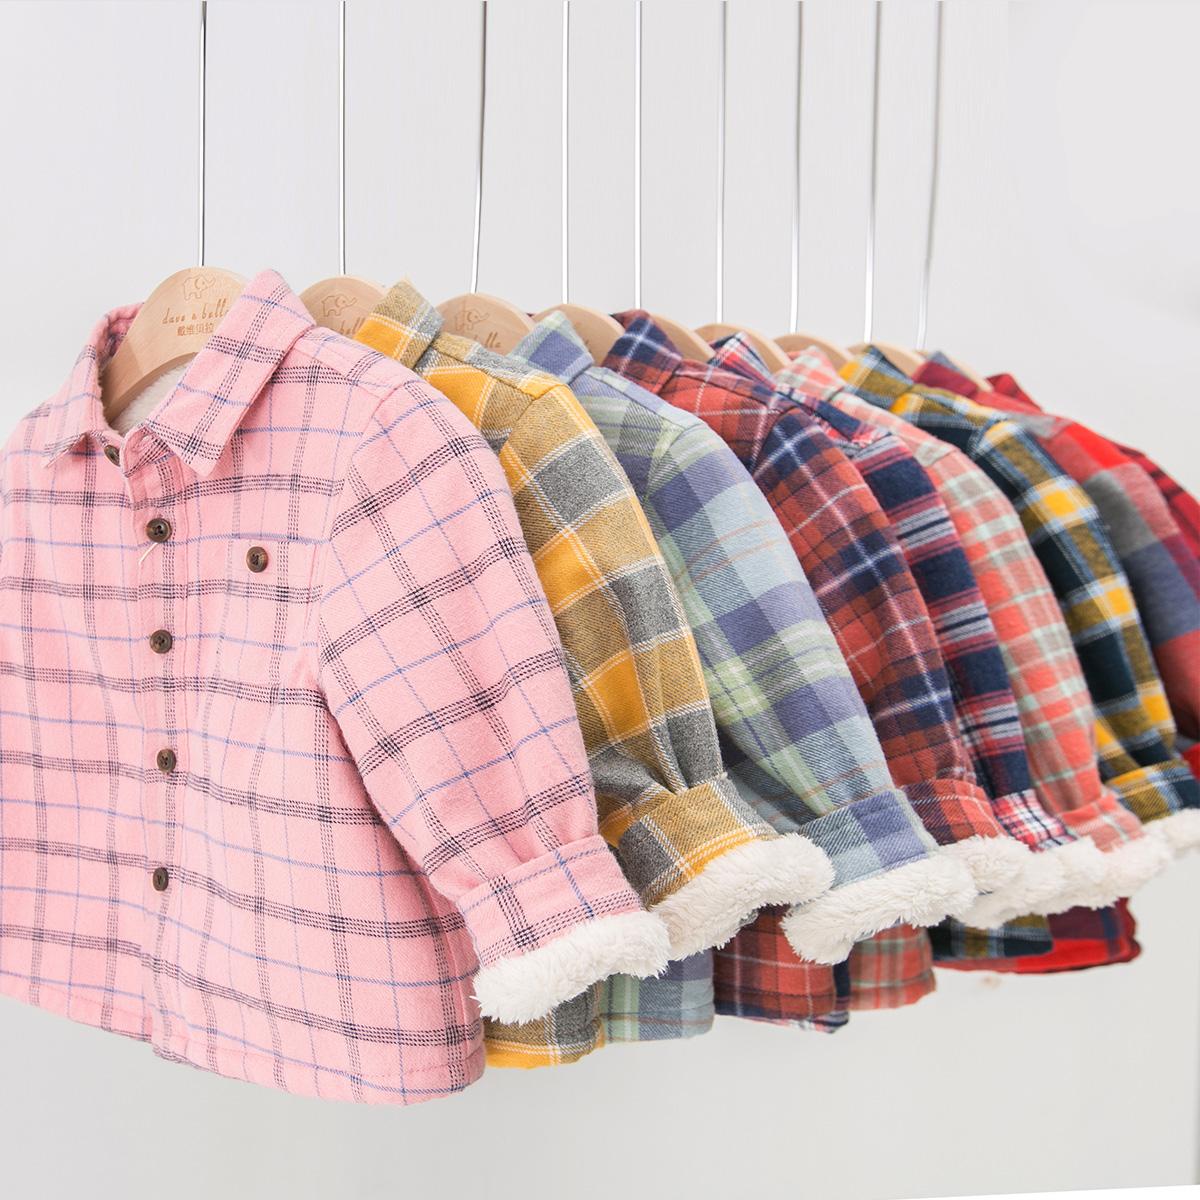 davebella戴维贝拉冬季男童衬衫 宝宝加绒格子翻领衬衫DB3842